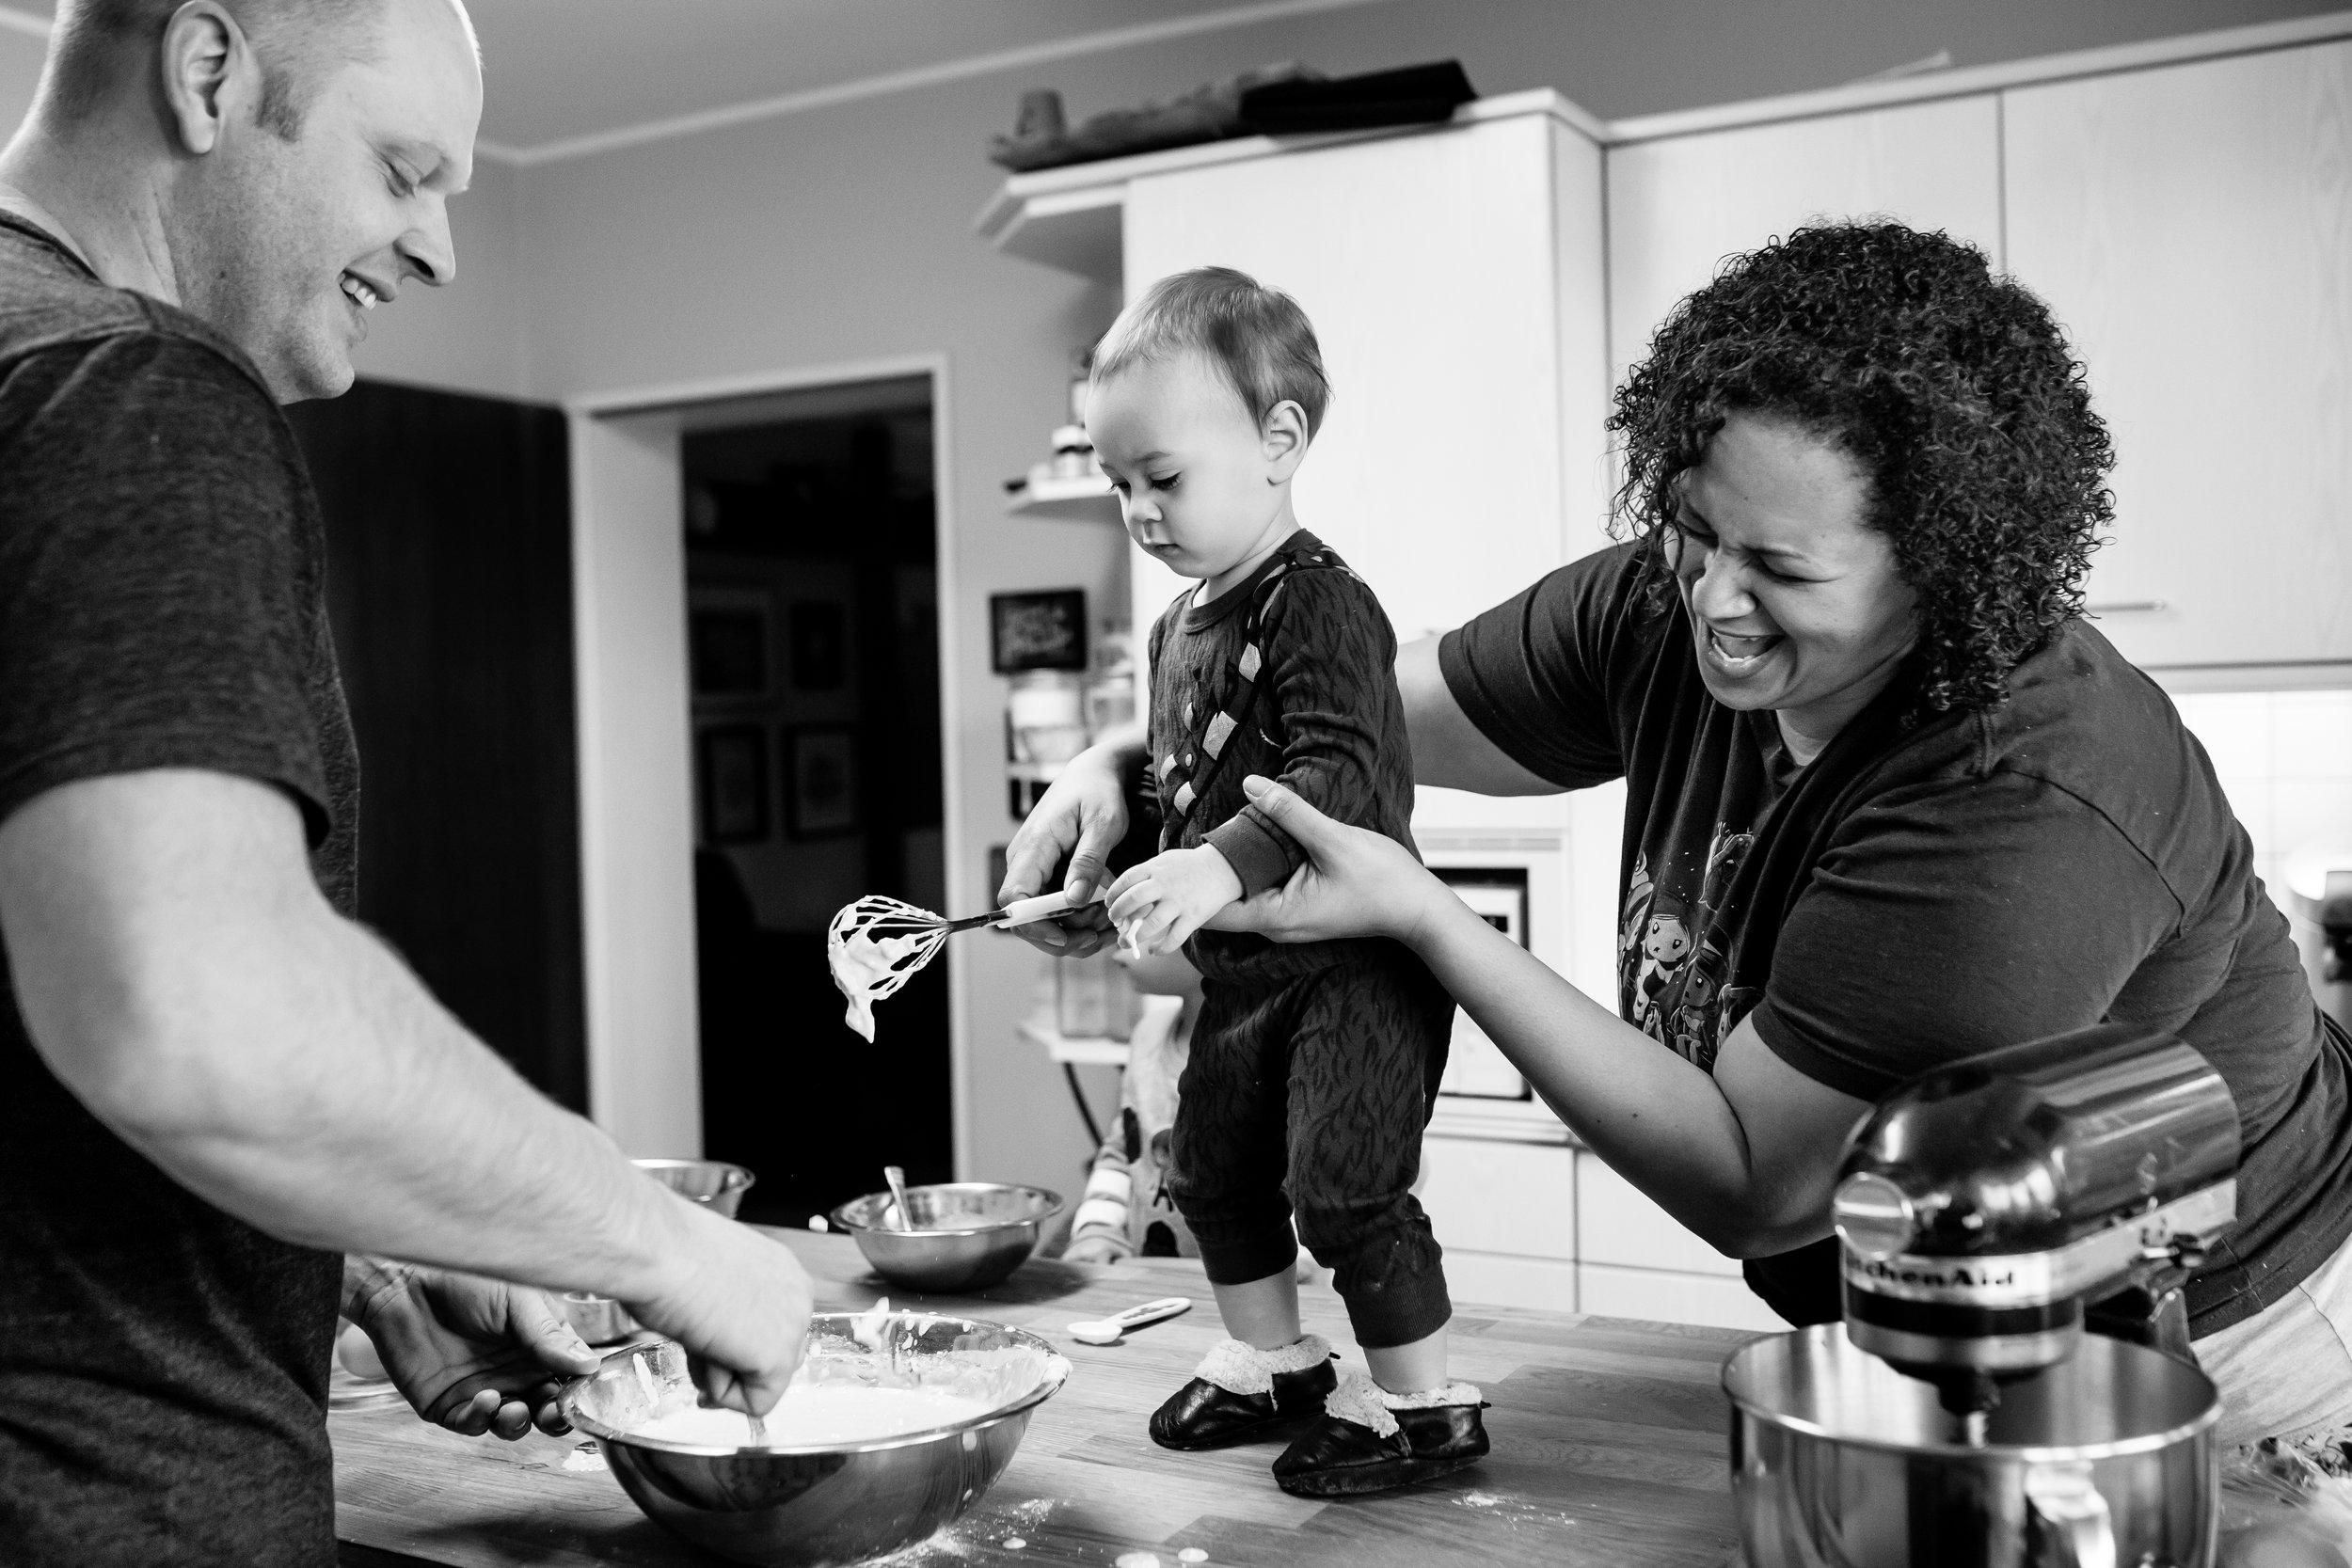 Mom and Dad laugh as baby makes mess mixing pancake batter